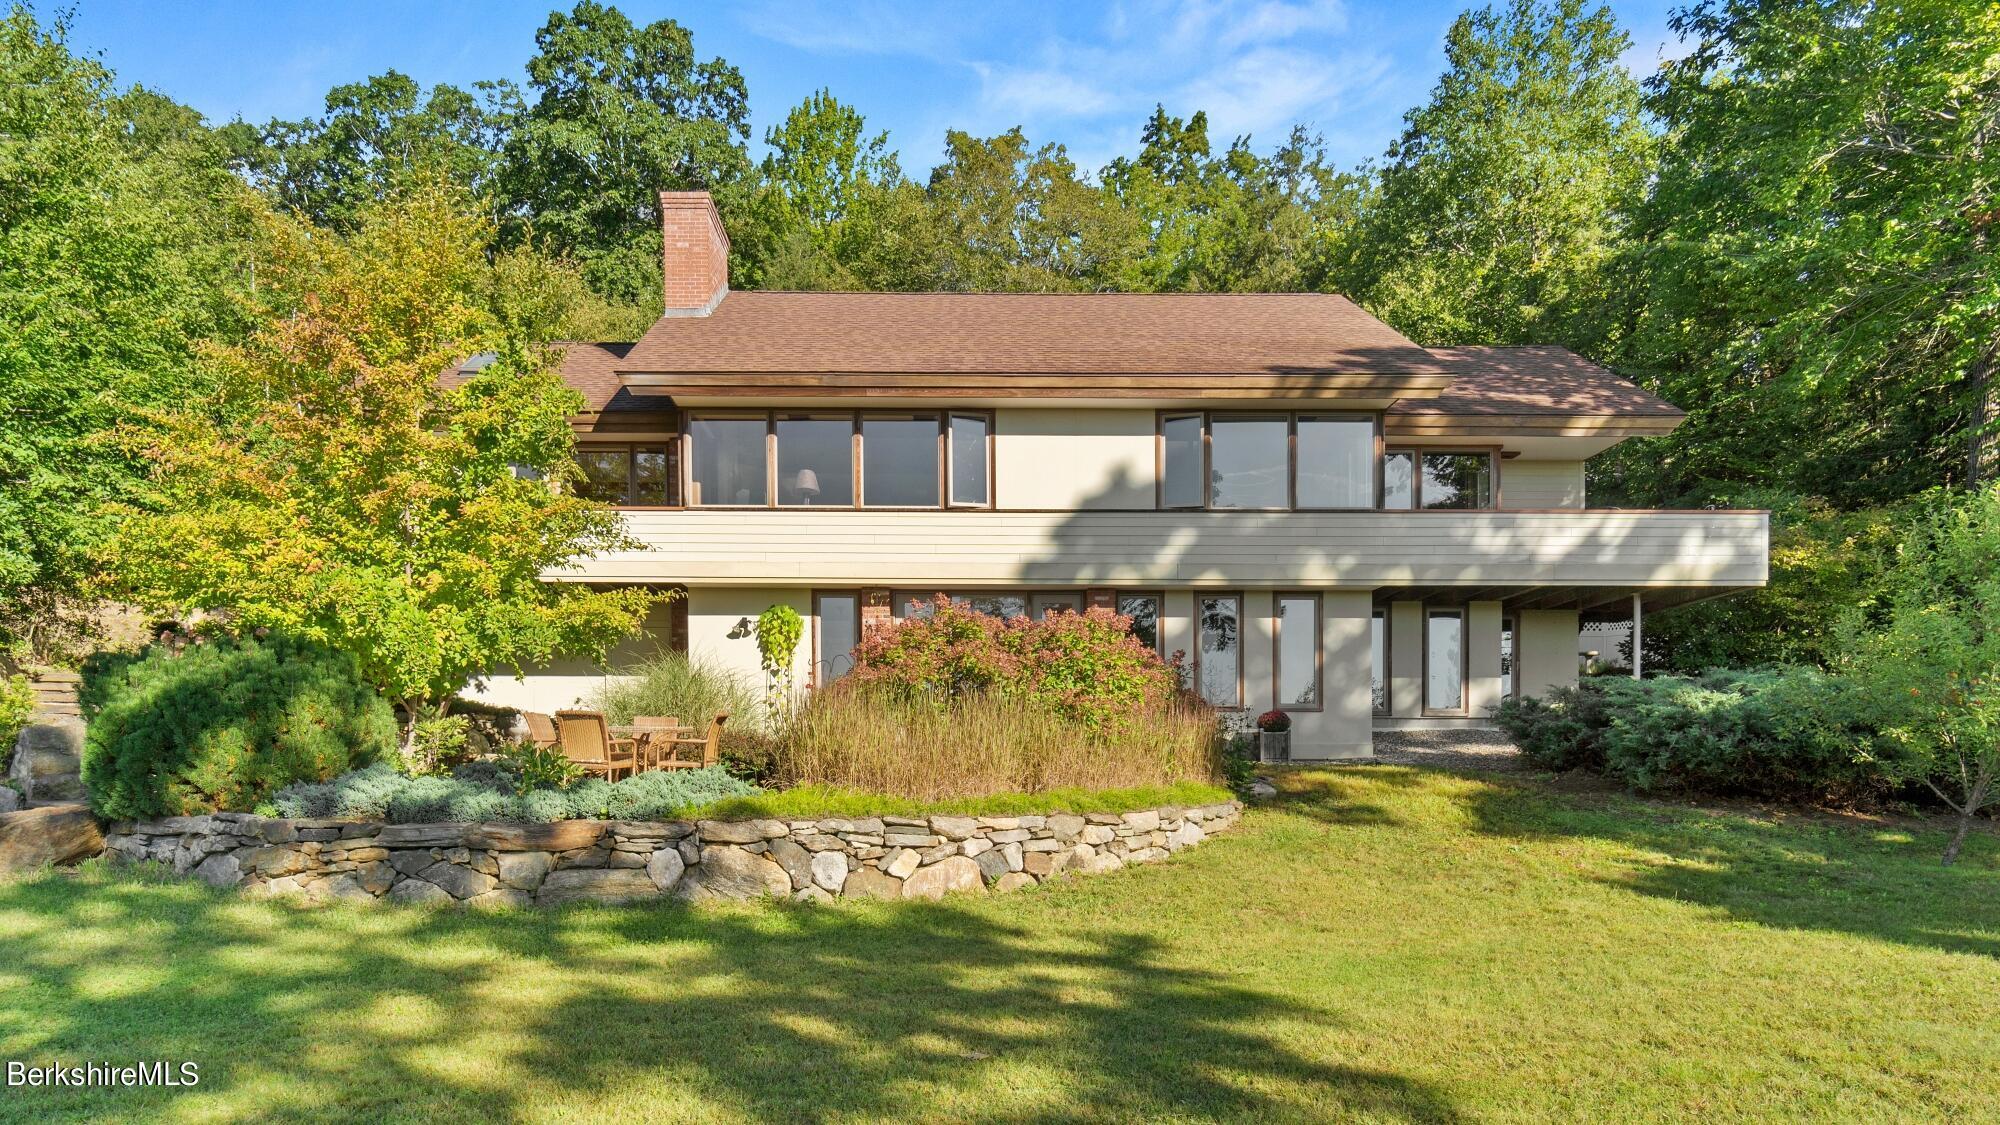 1290 Main, Granville, Massachusetts 01034, 3 Bedrooms Bedrooms, 8 Rooms Rooms,3 BathroomsBathrooms,Residential,For Sale,Main,235763